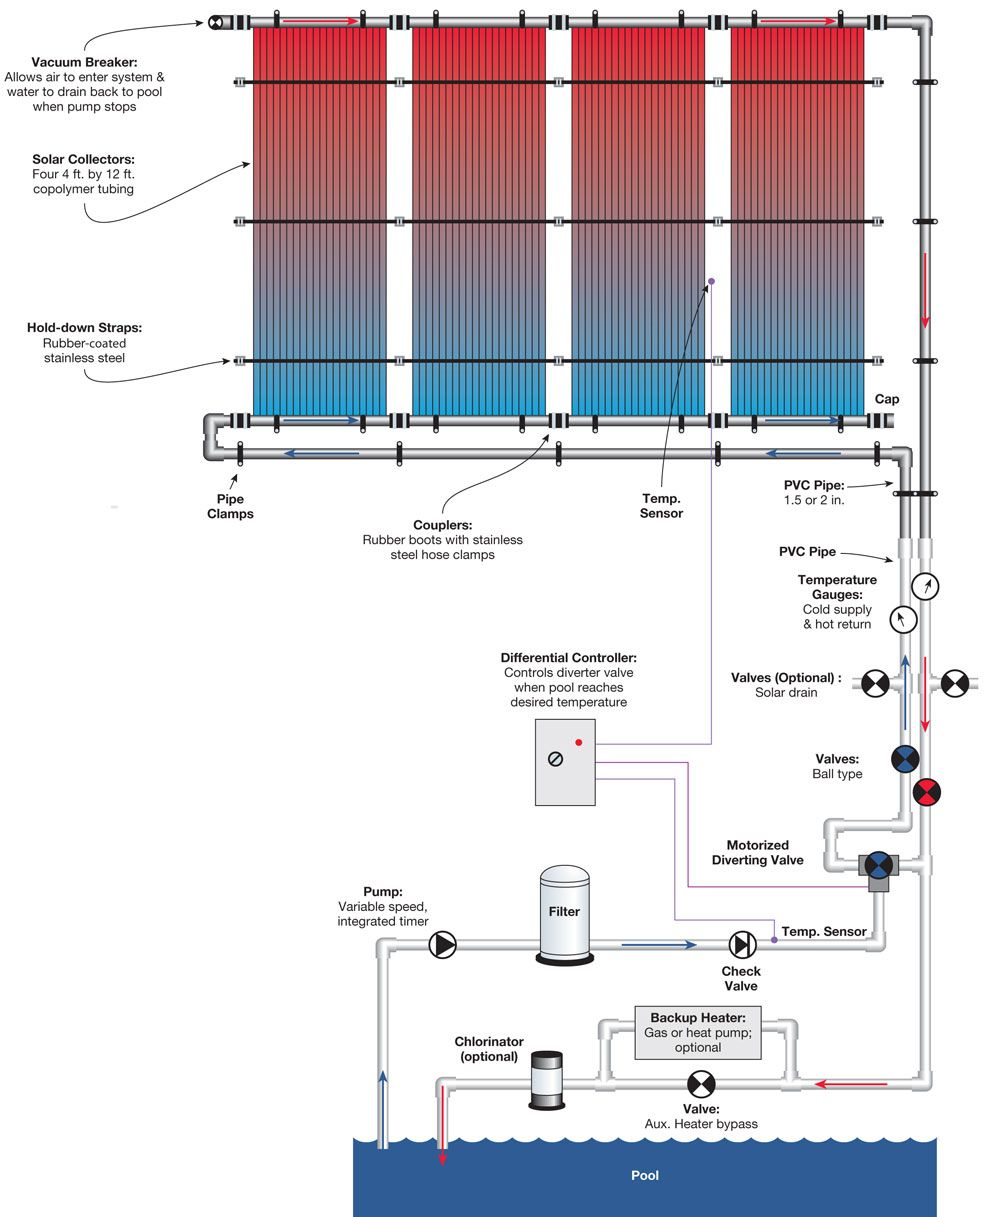 7 Specs Schematic Woodruff Skiz Jpg 1000 1217 Solar Panels Solar Installation Solar Heating